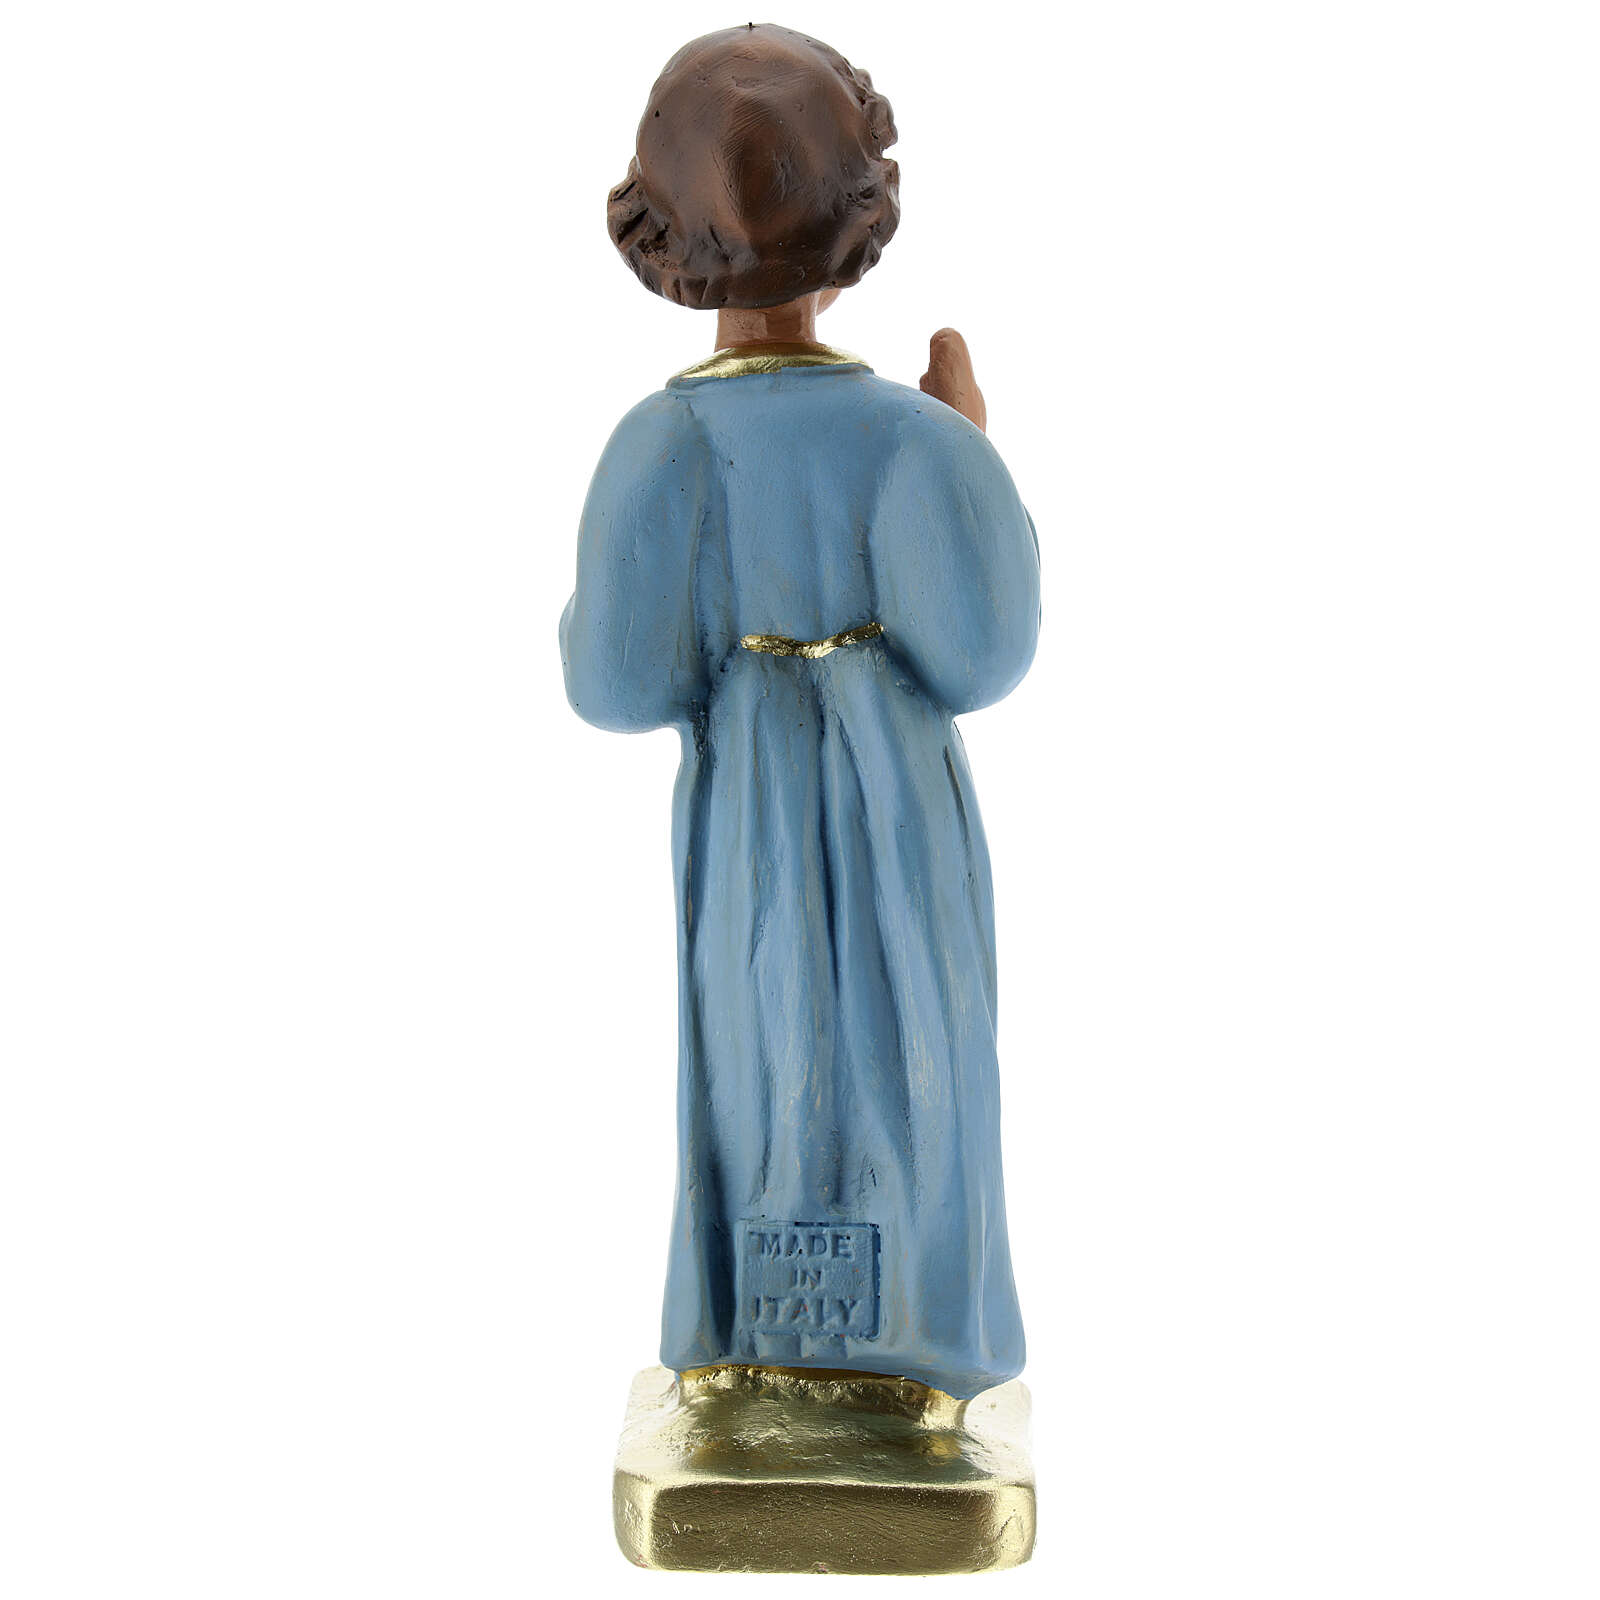 Bambino Benedicente statua gesso 20 cm dipinta Barsanti 4